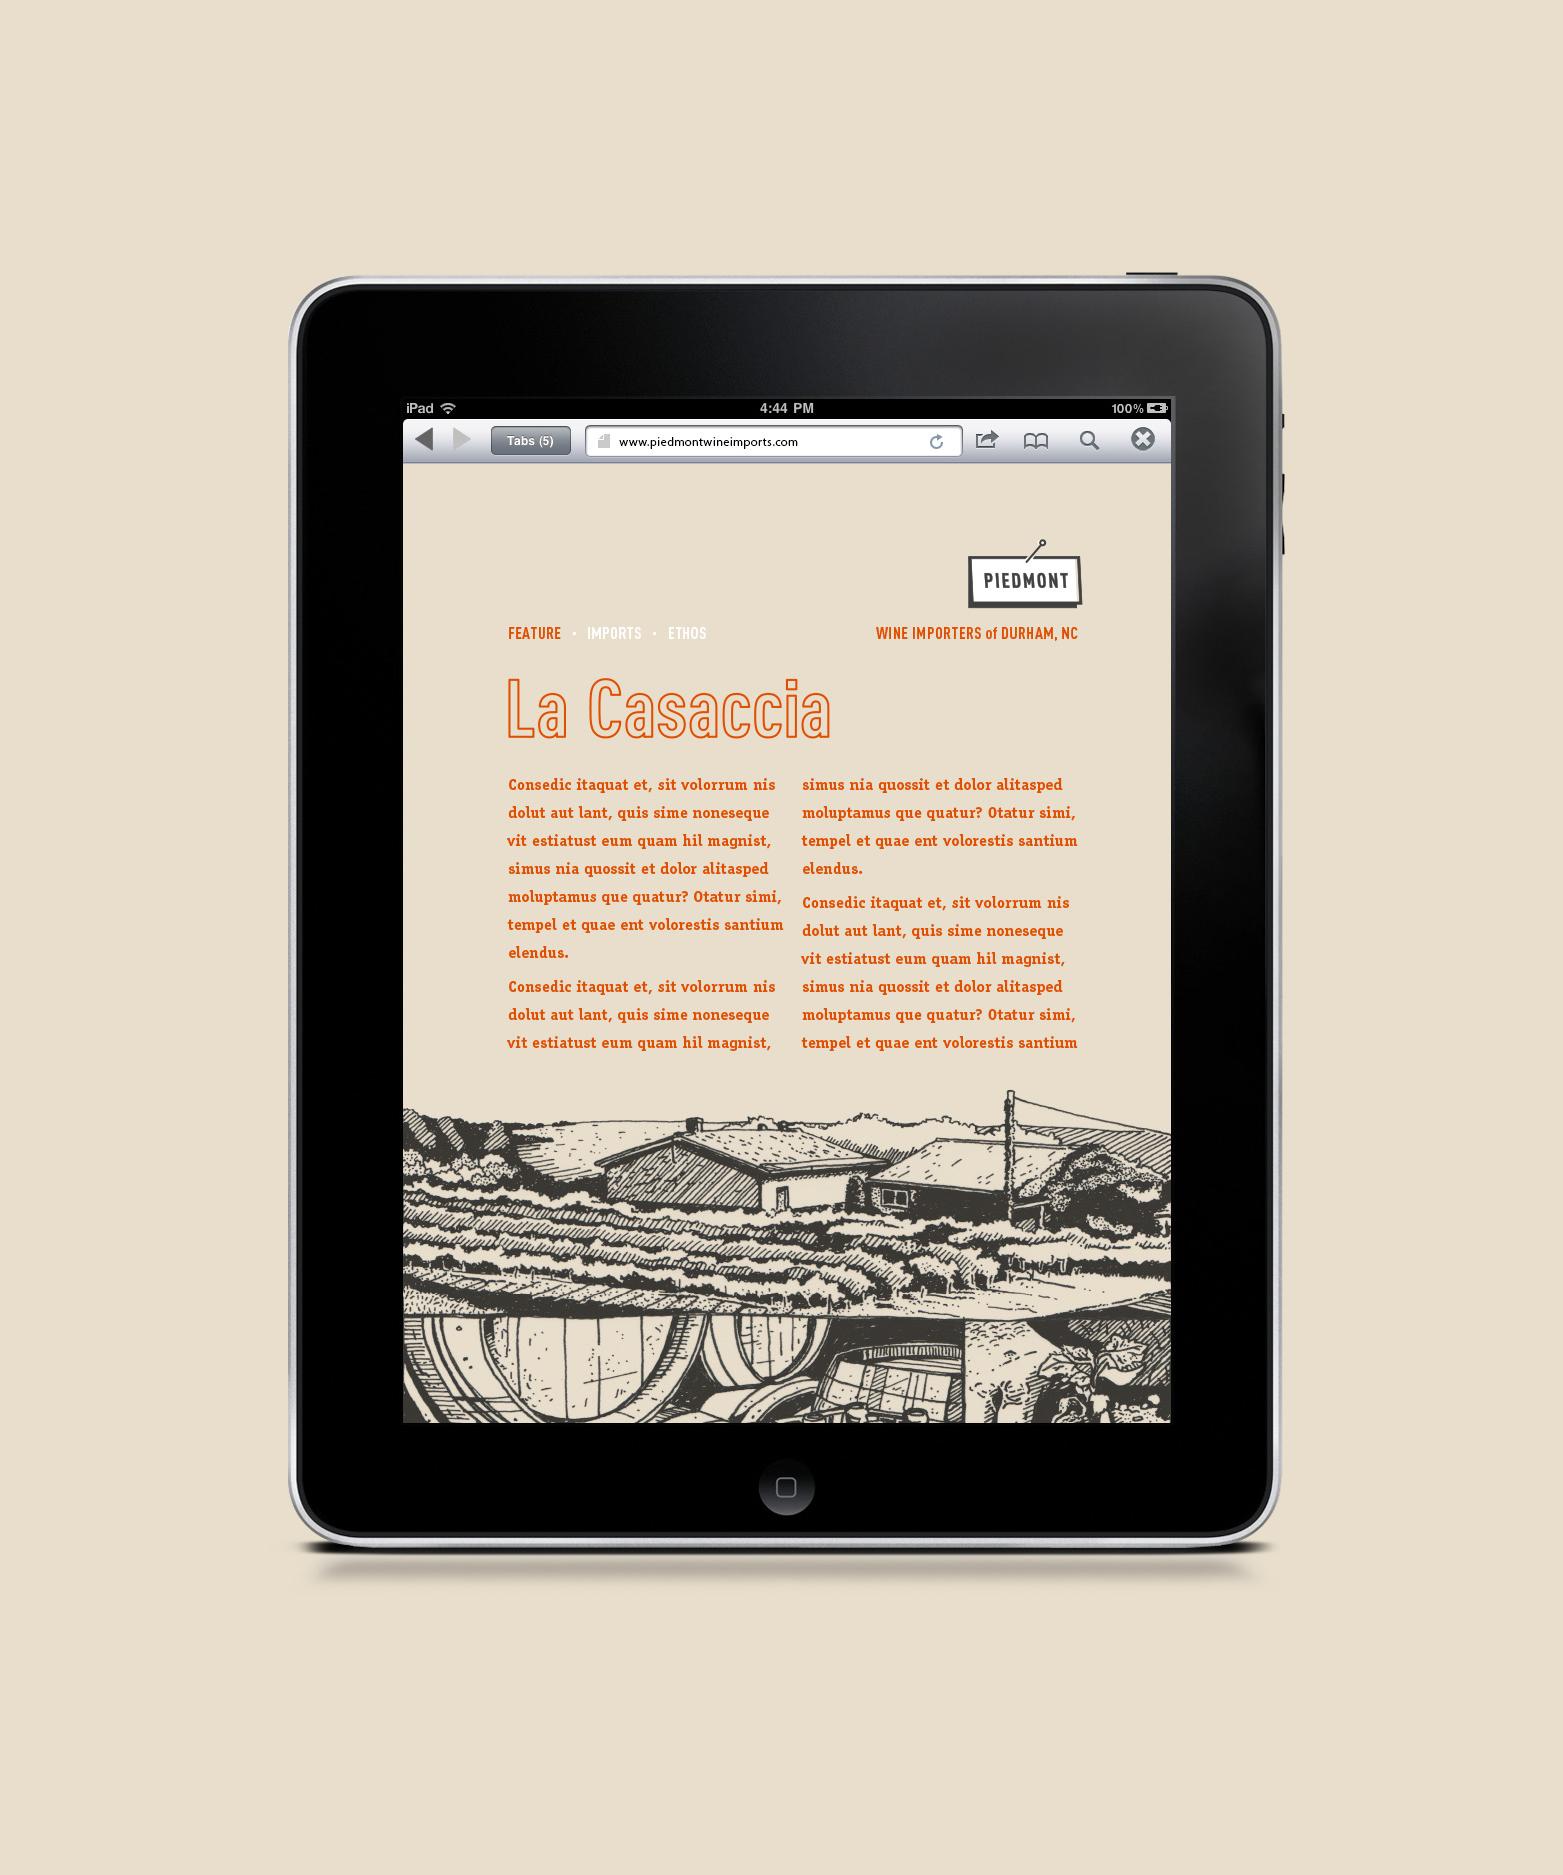 Piedmont Brand_tablet.jpg